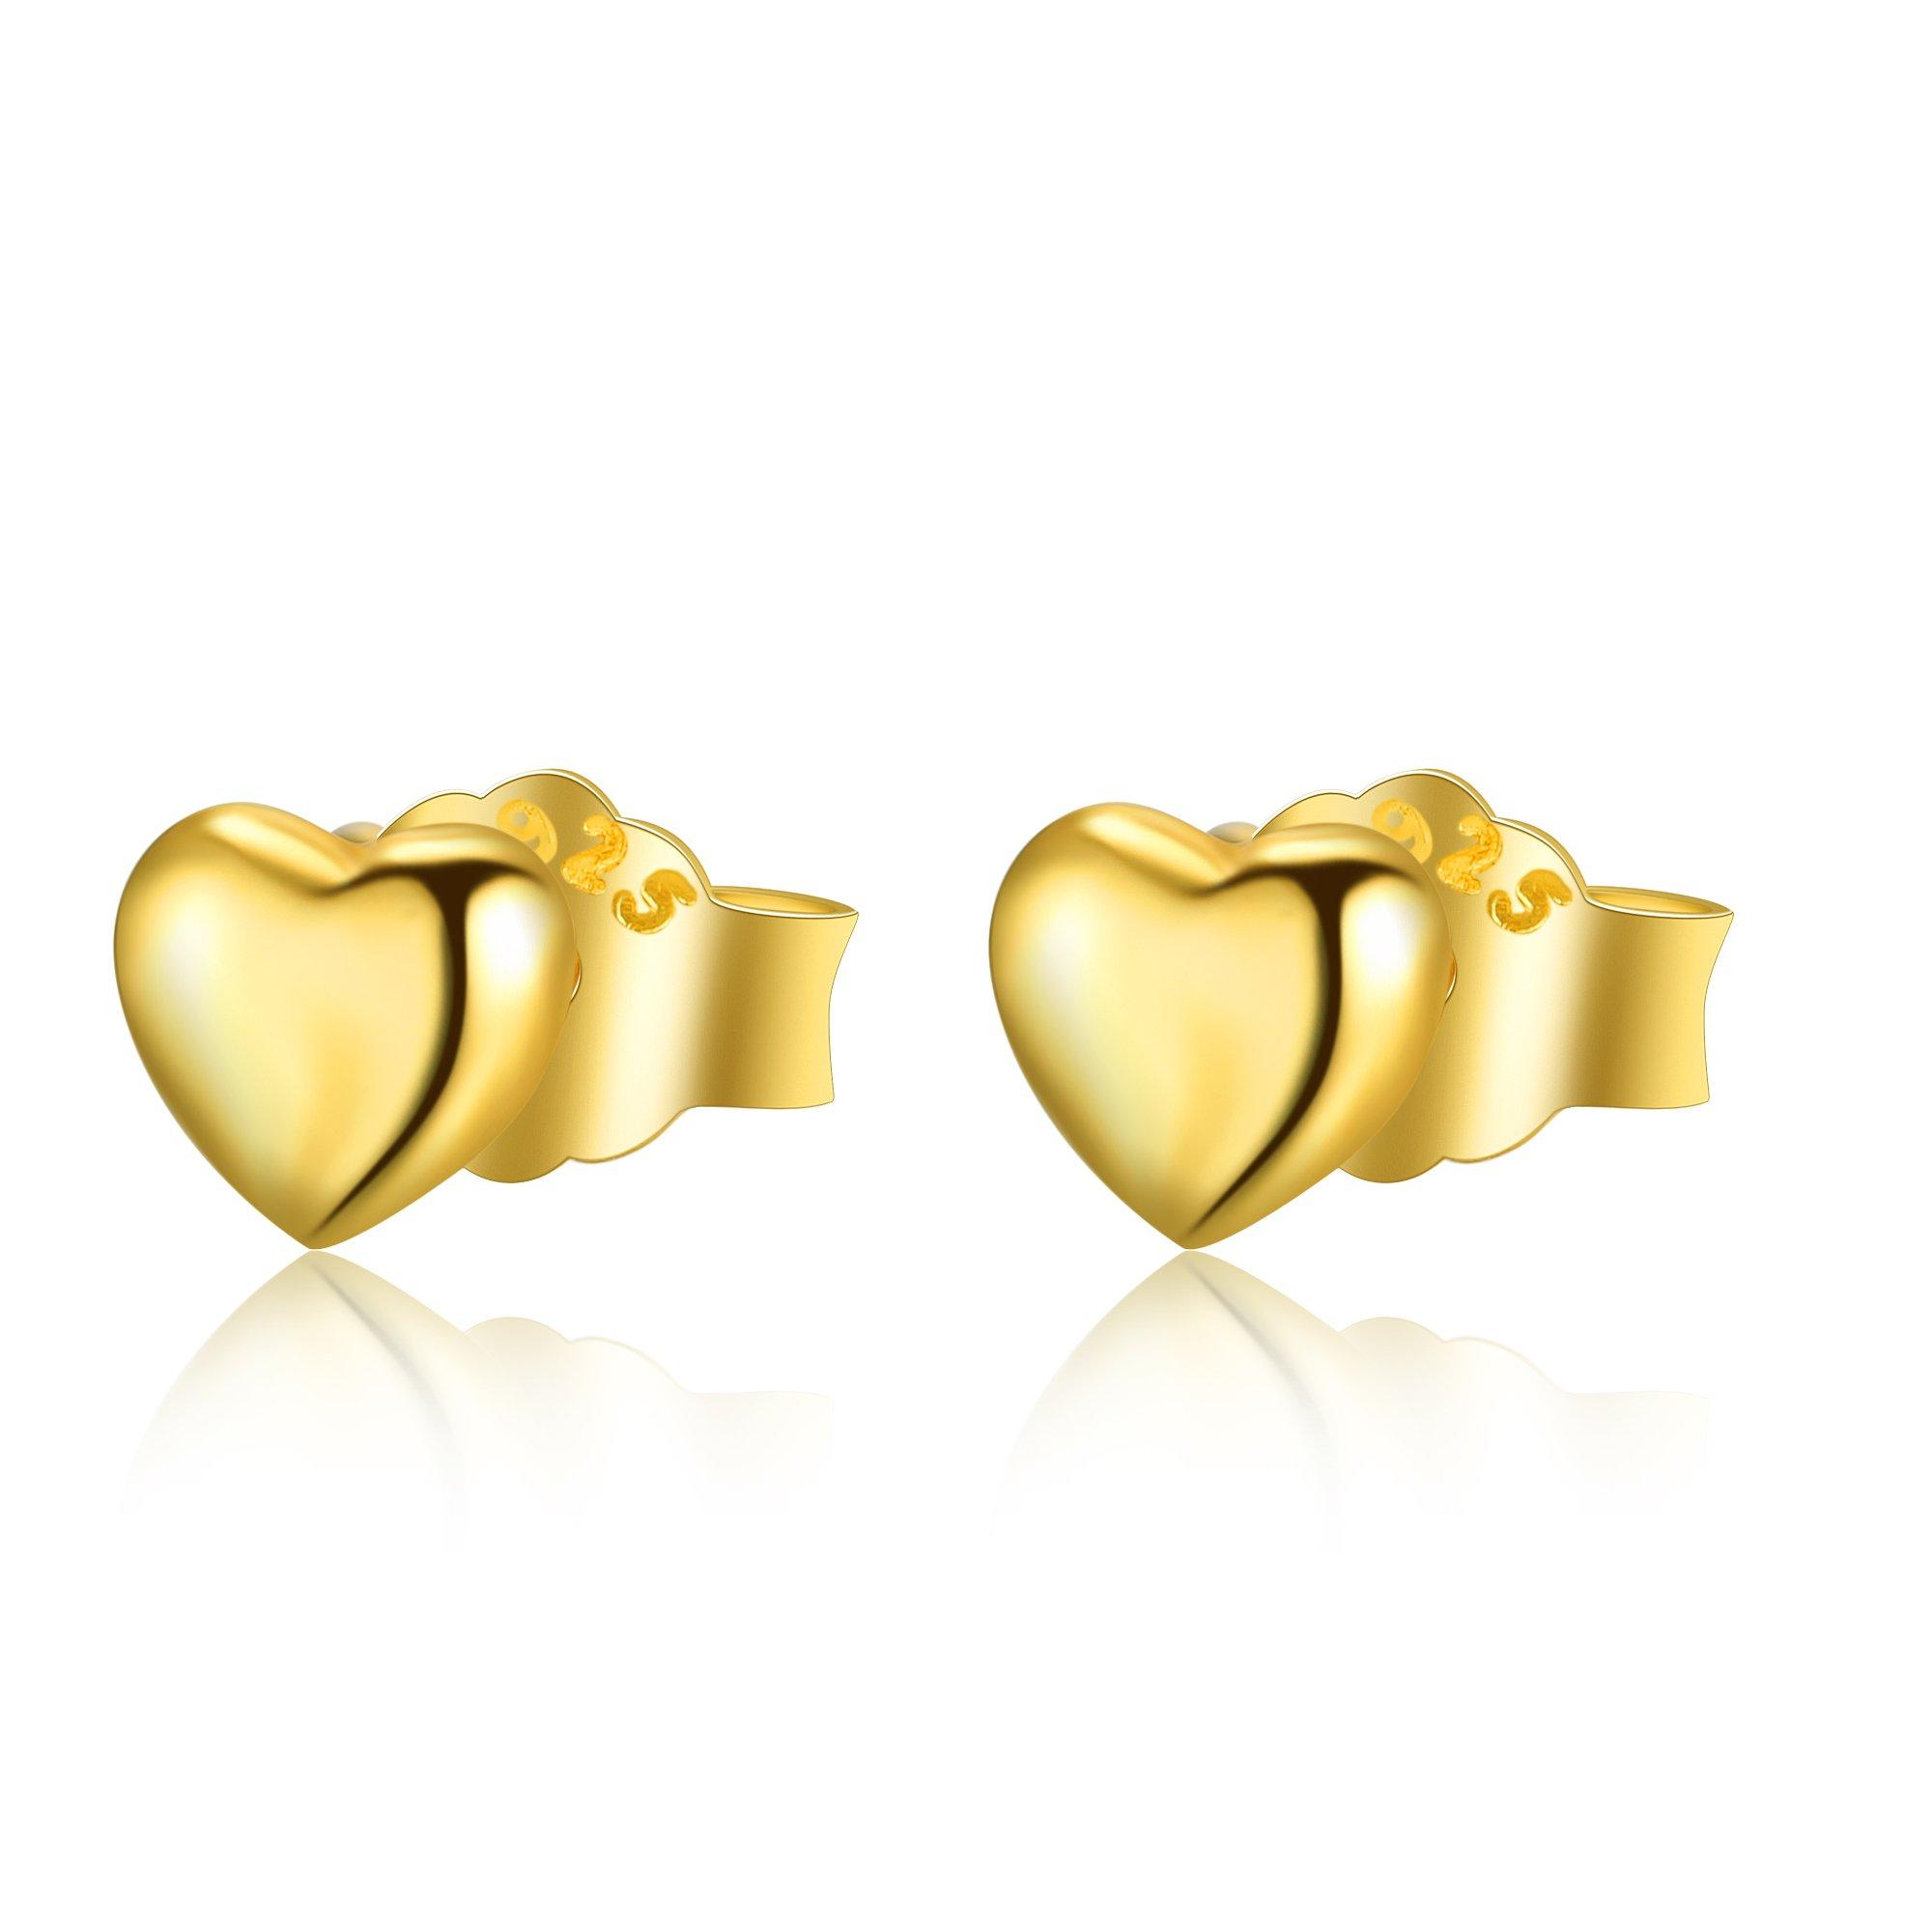 Sterling Silver Heart Stud Earrings, Simple Heart Shaped Stud Earrings for Women (yellow-gold-plated-silver)